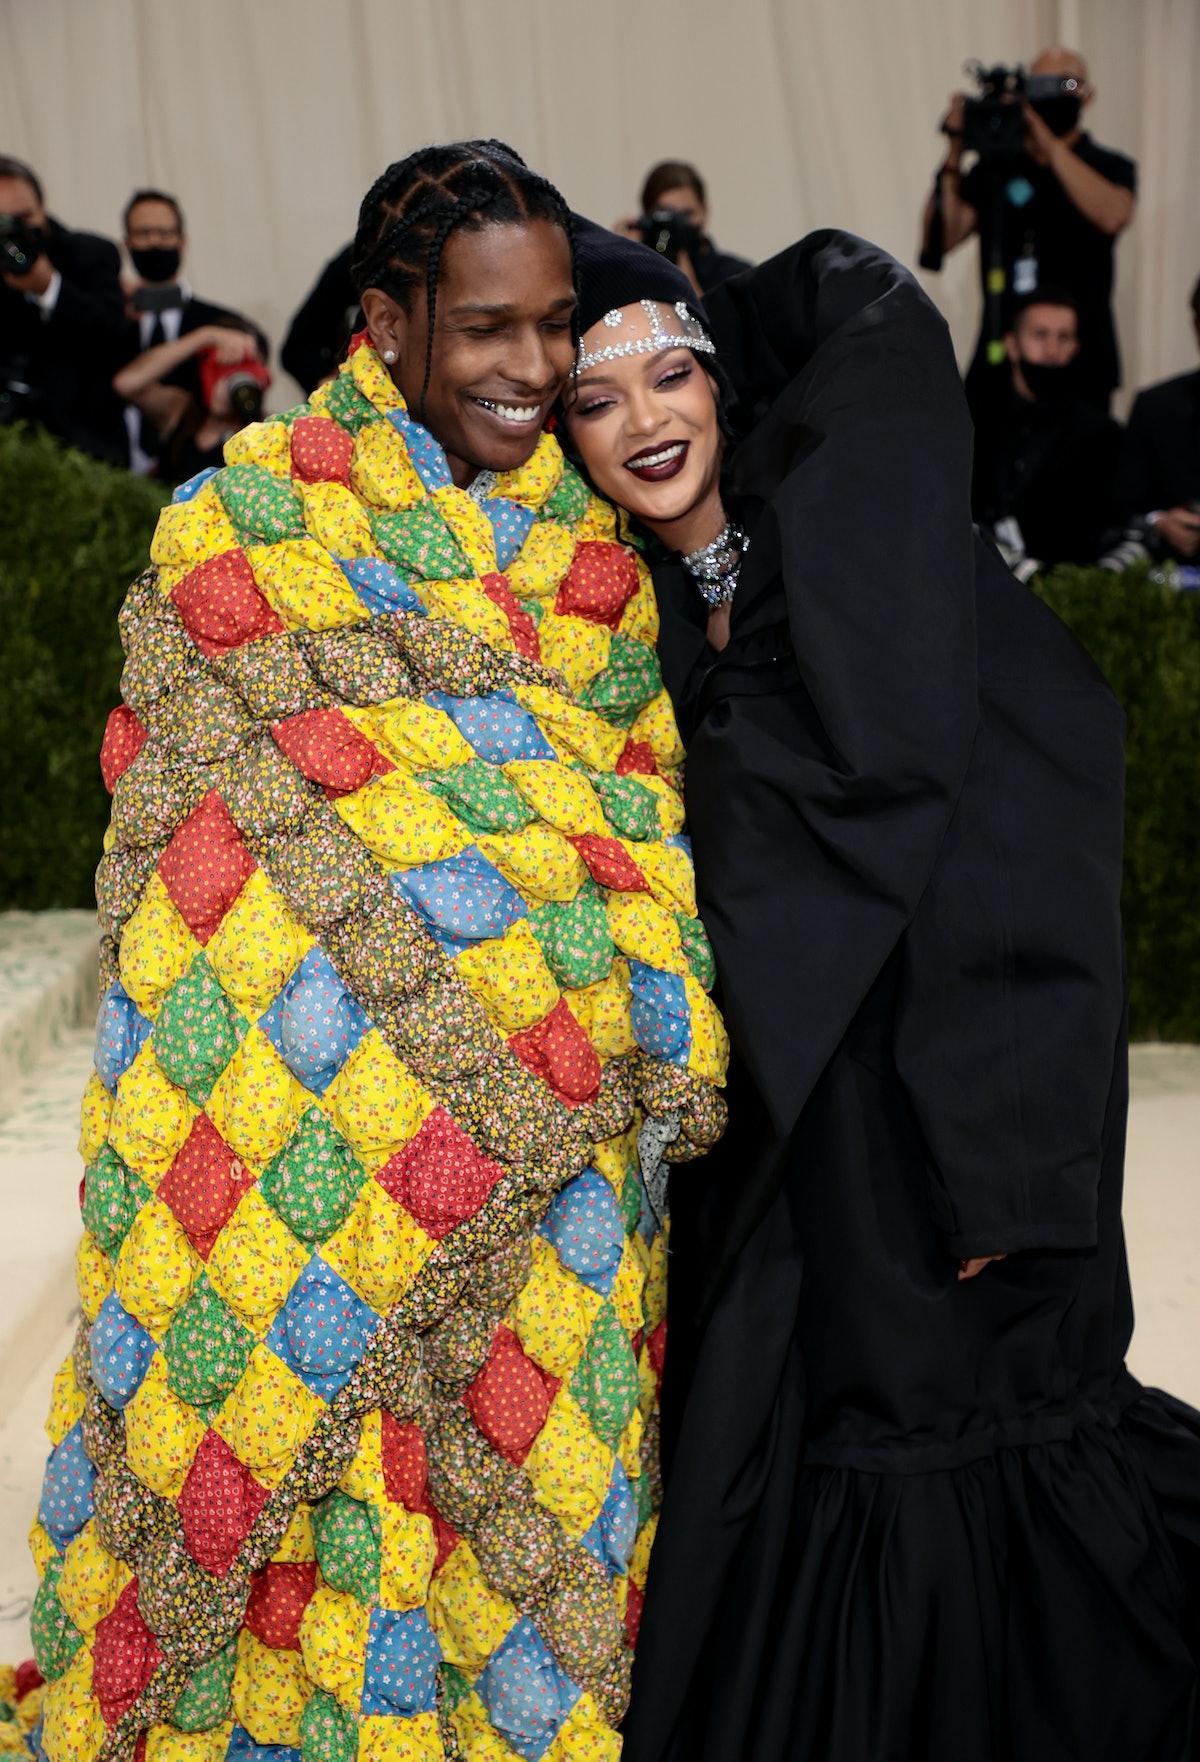 Rihanna and ASAP Rocky's Met Gala body language is genuine.